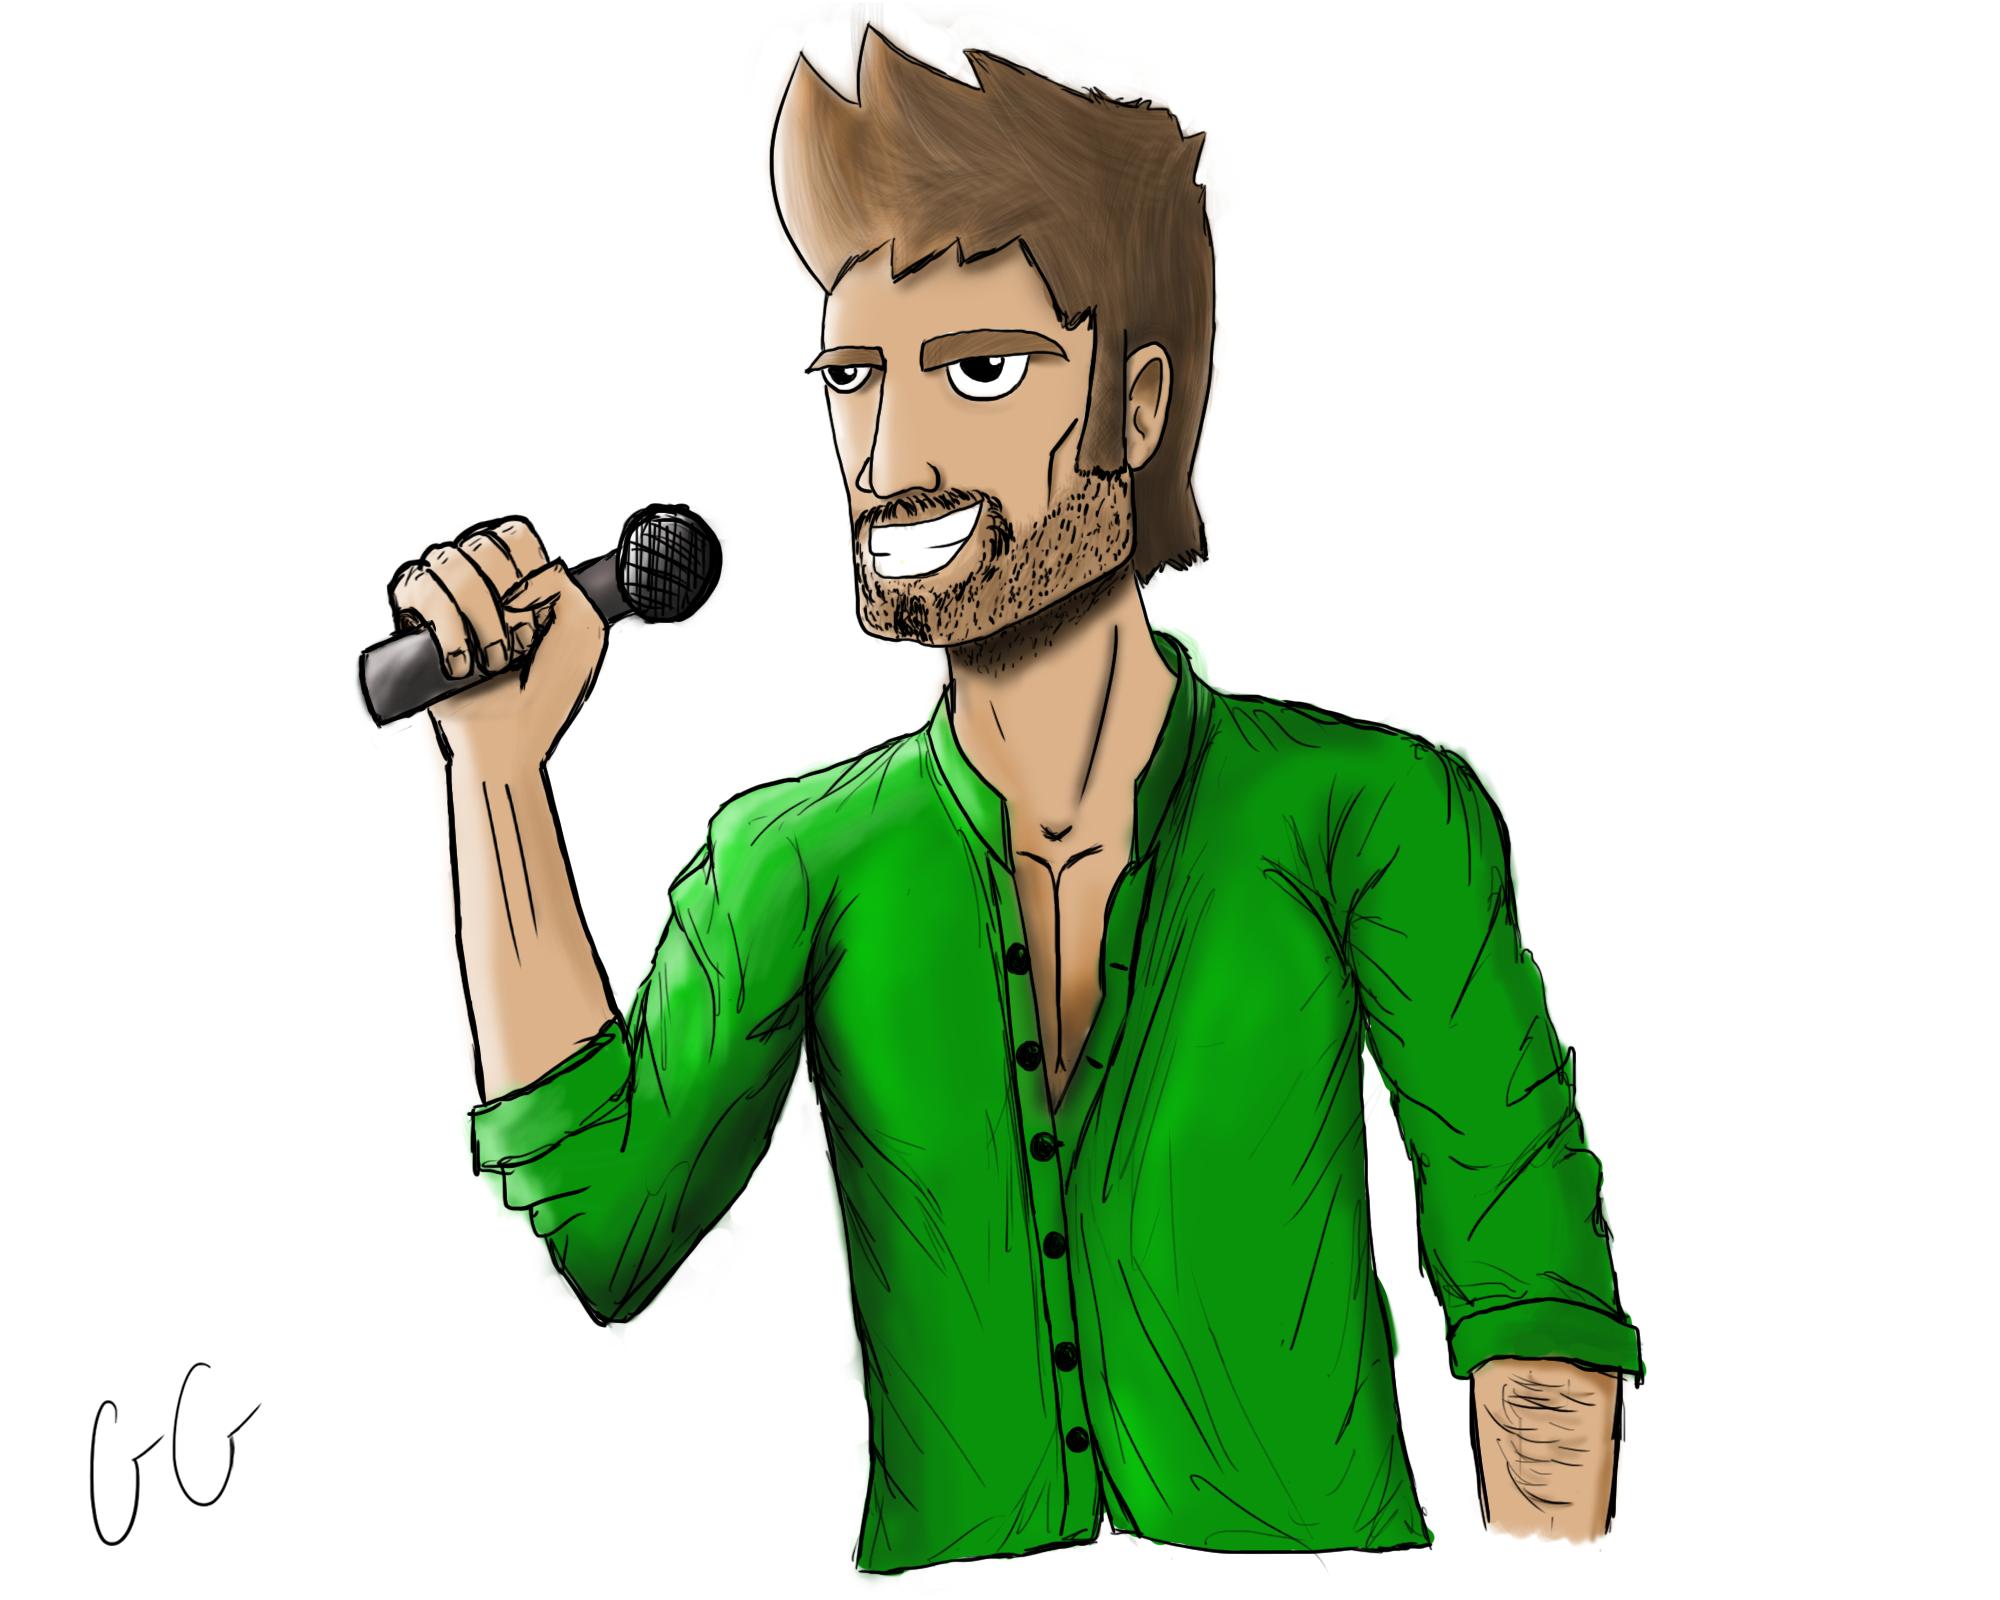 Cool Singer CHARACTER DESIGN